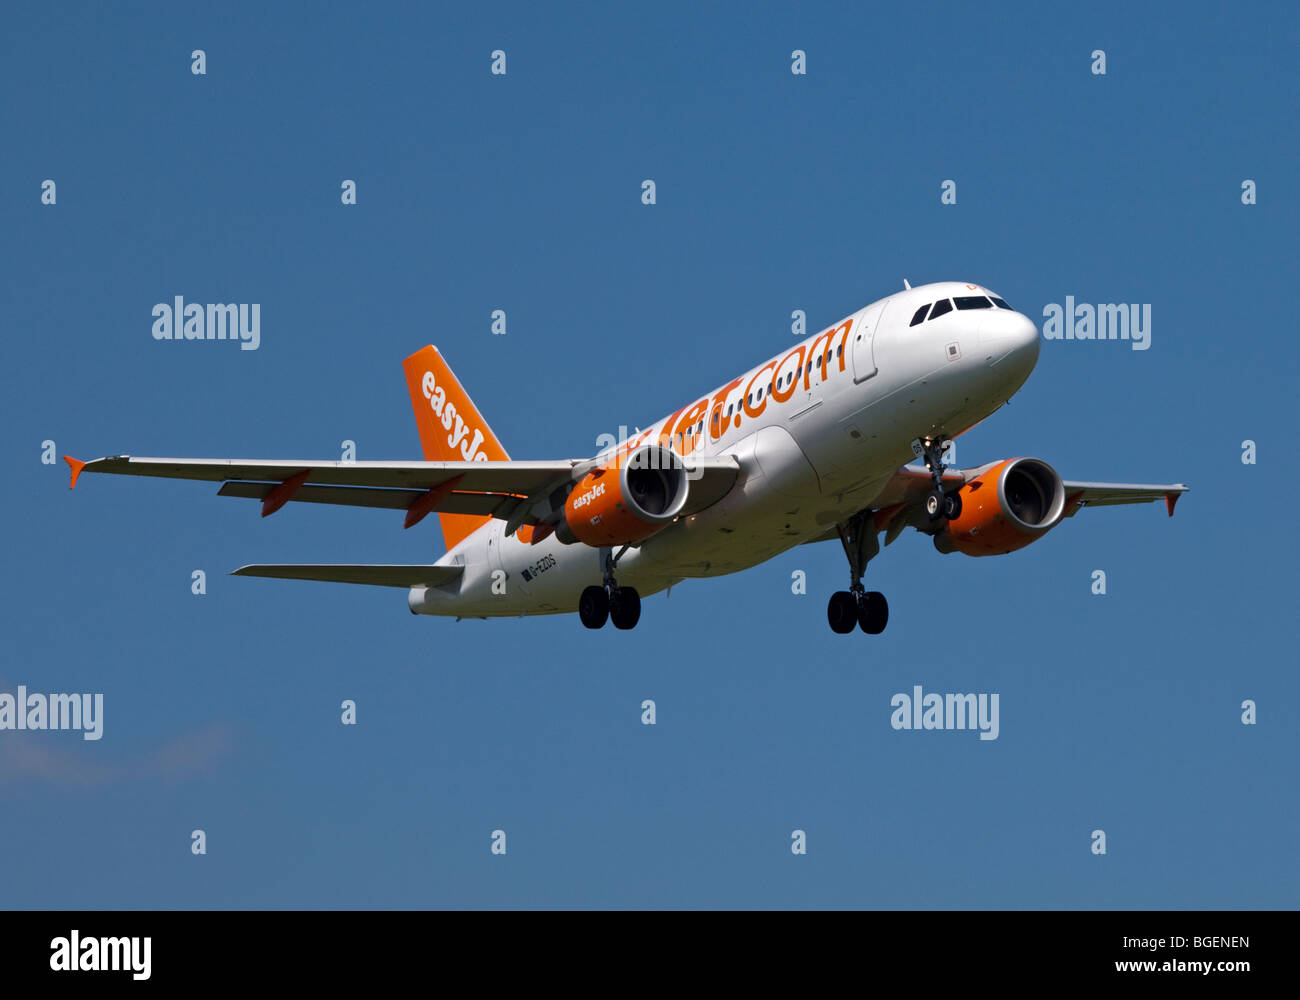 EasyJet Airbus A319 Aircraft landing at Gatwick Airport, England - Stock Image